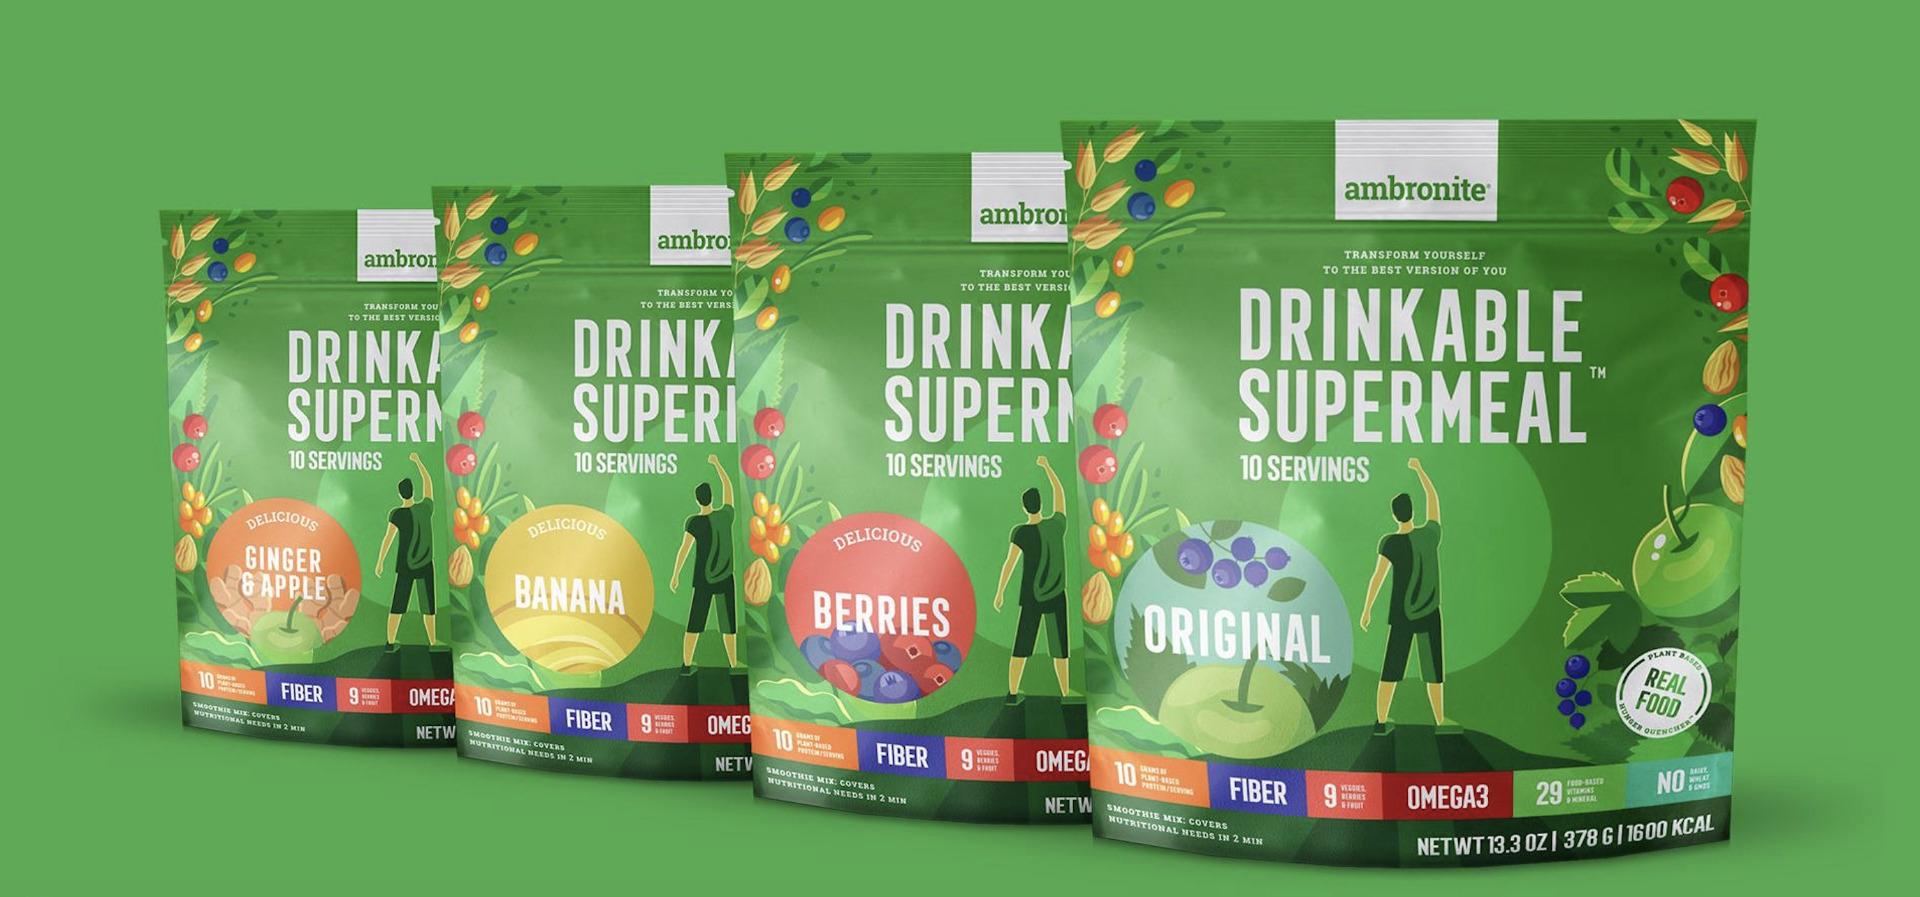 Ambronite 4-Flavor Bundle Subscription 17% off